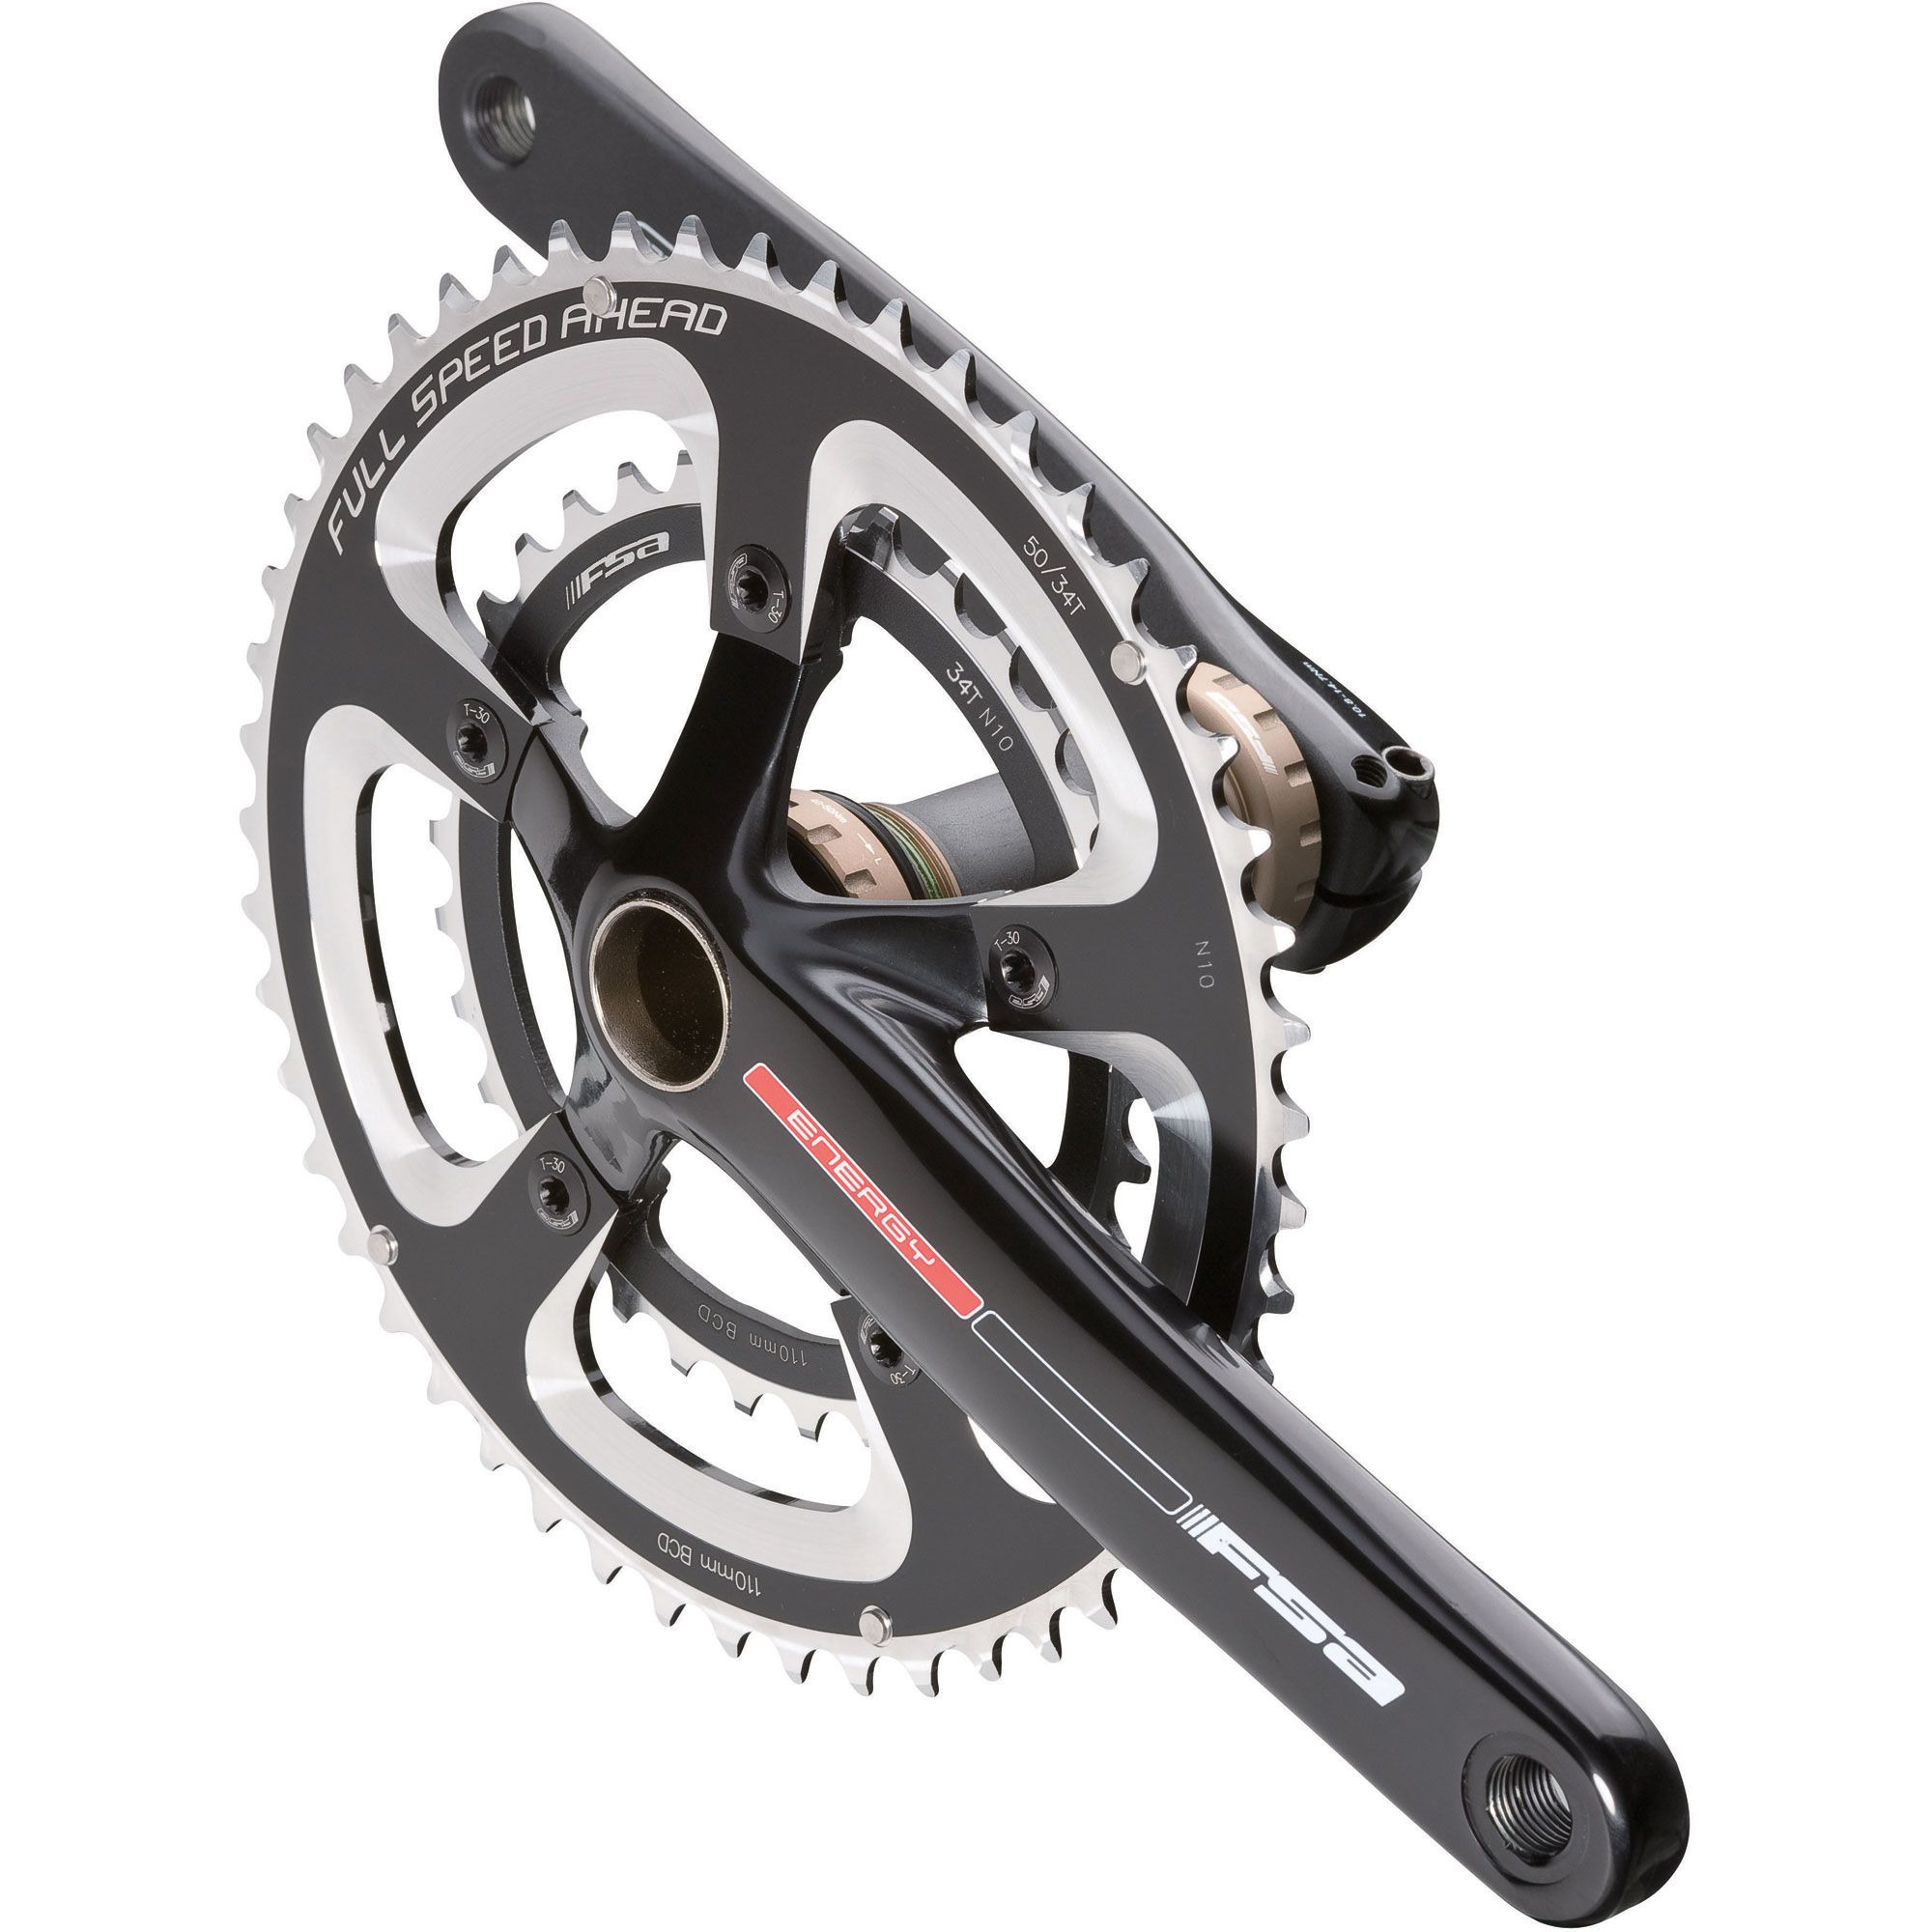 Fsa Energy Compact Crankset Blue Ridge Cyclery